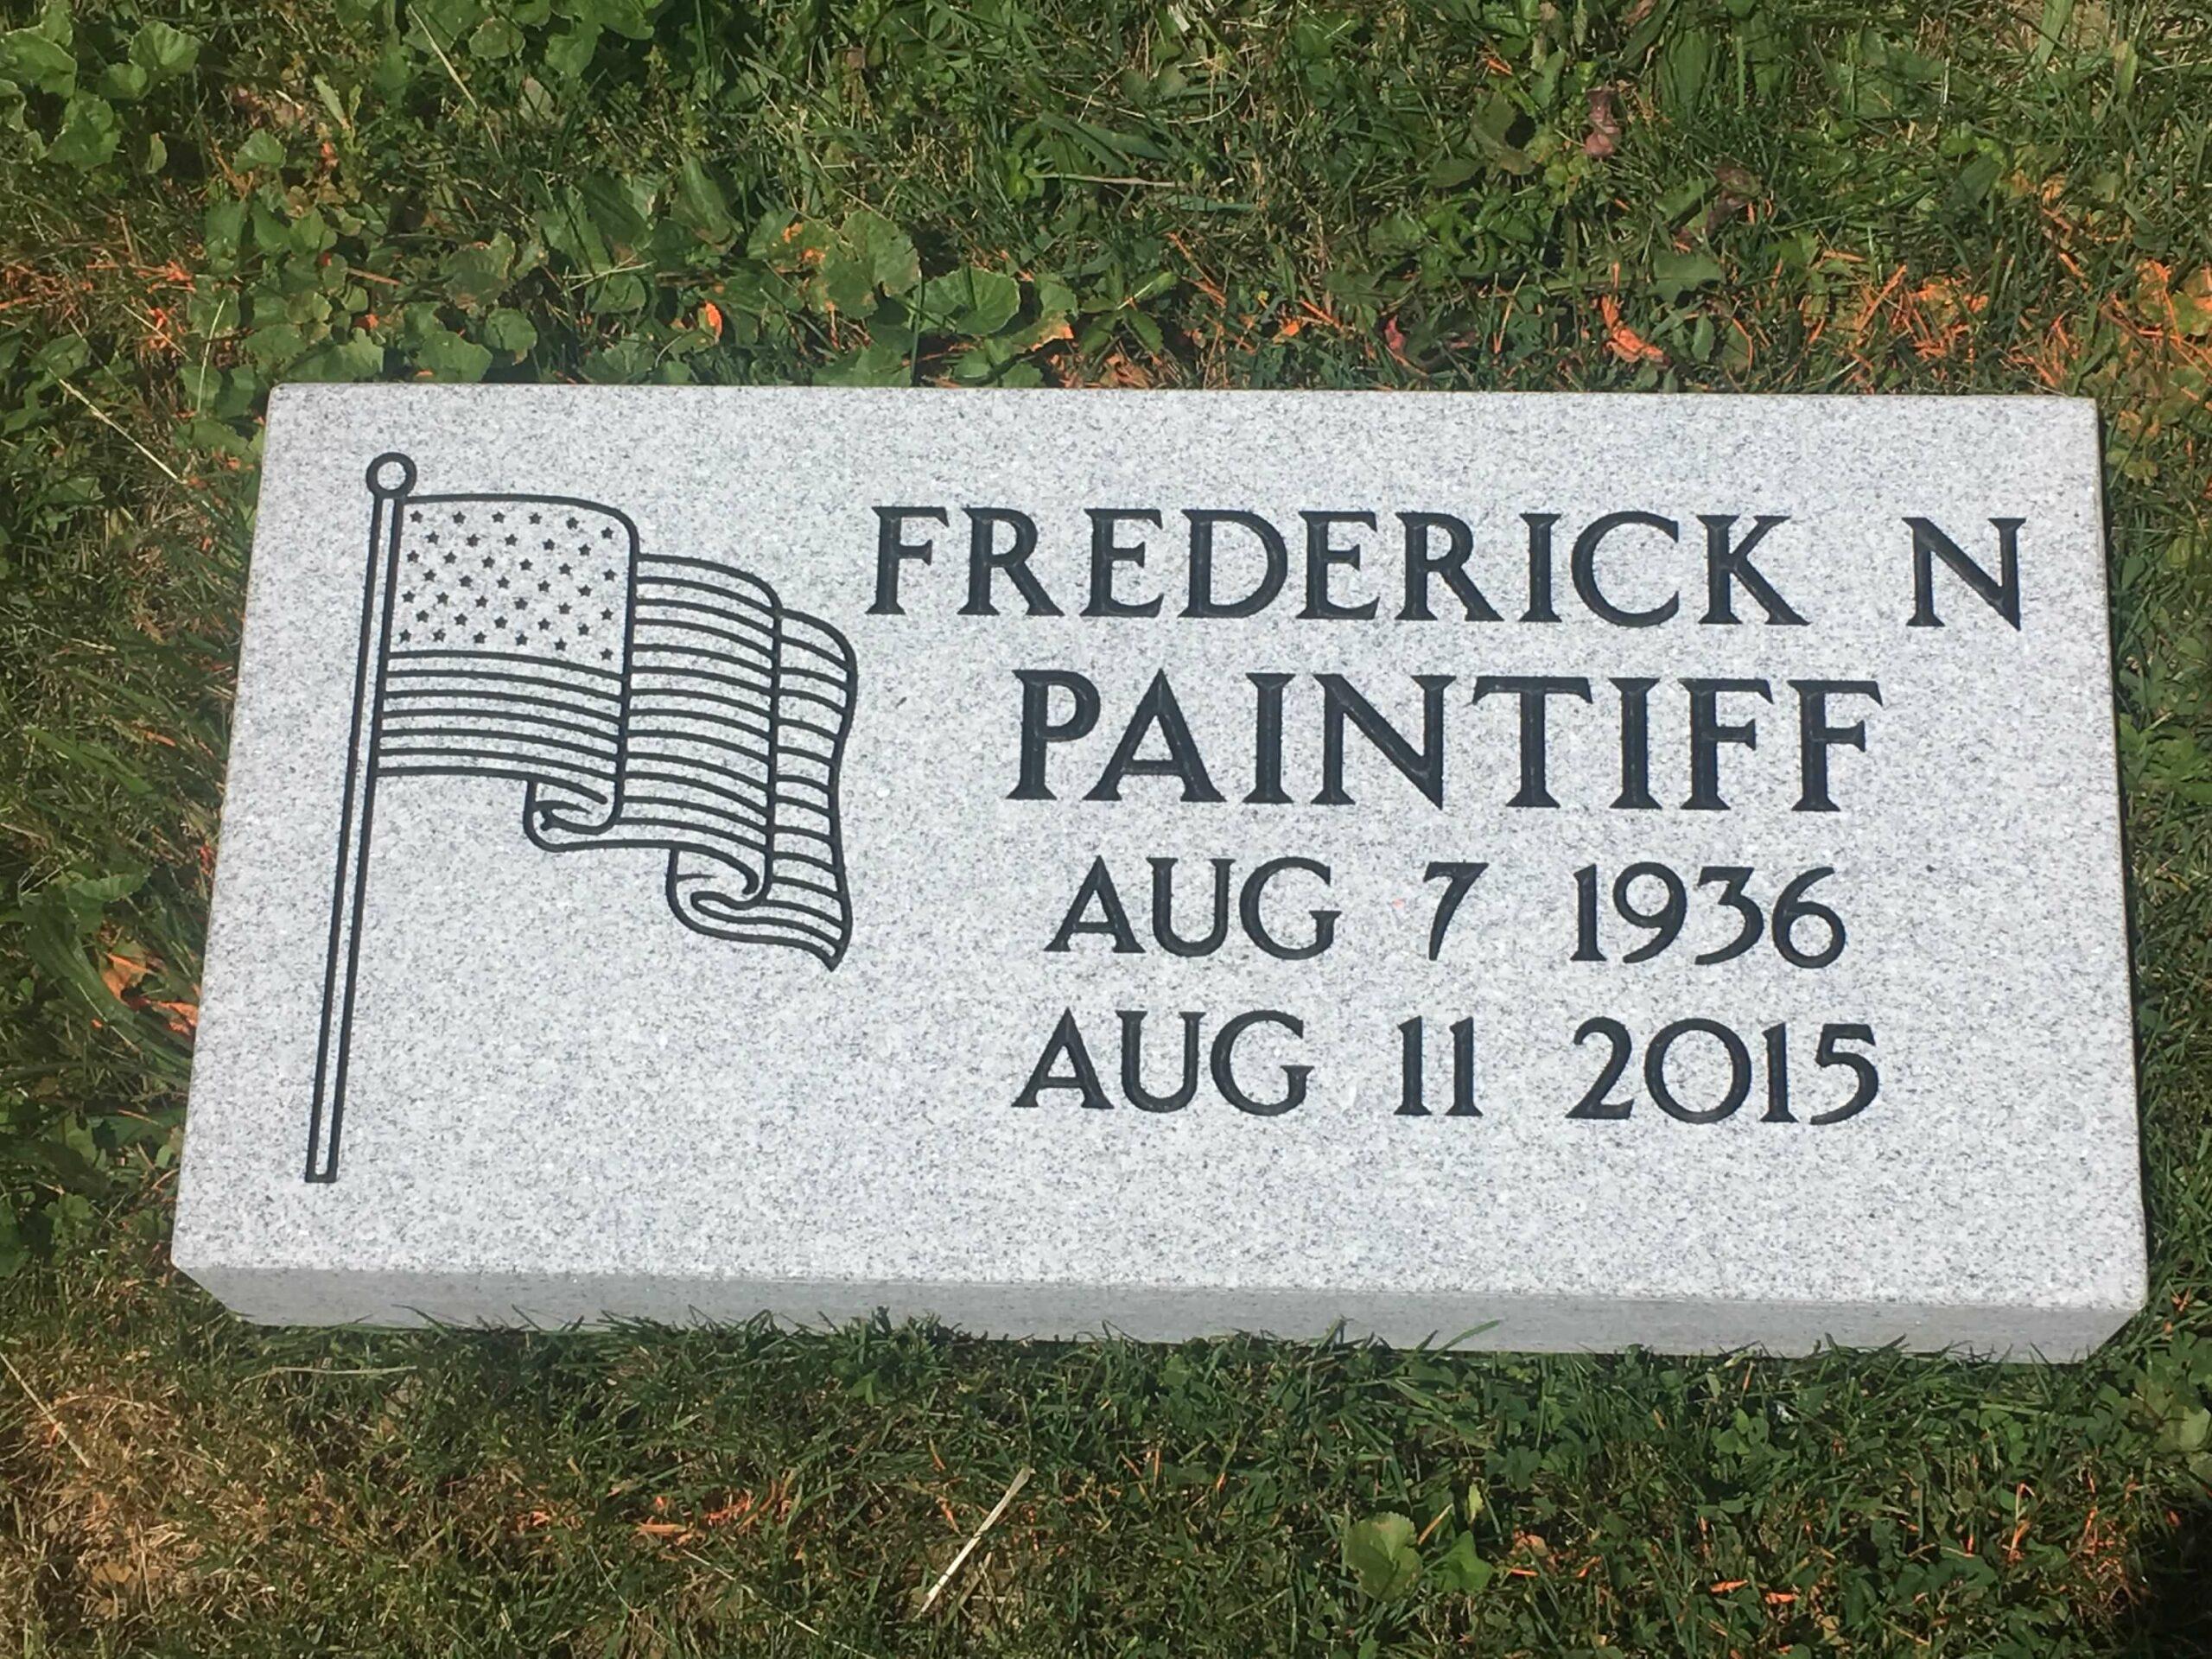 Paintiff, Frederick - Woodlawn Cem., 2-8, Gray